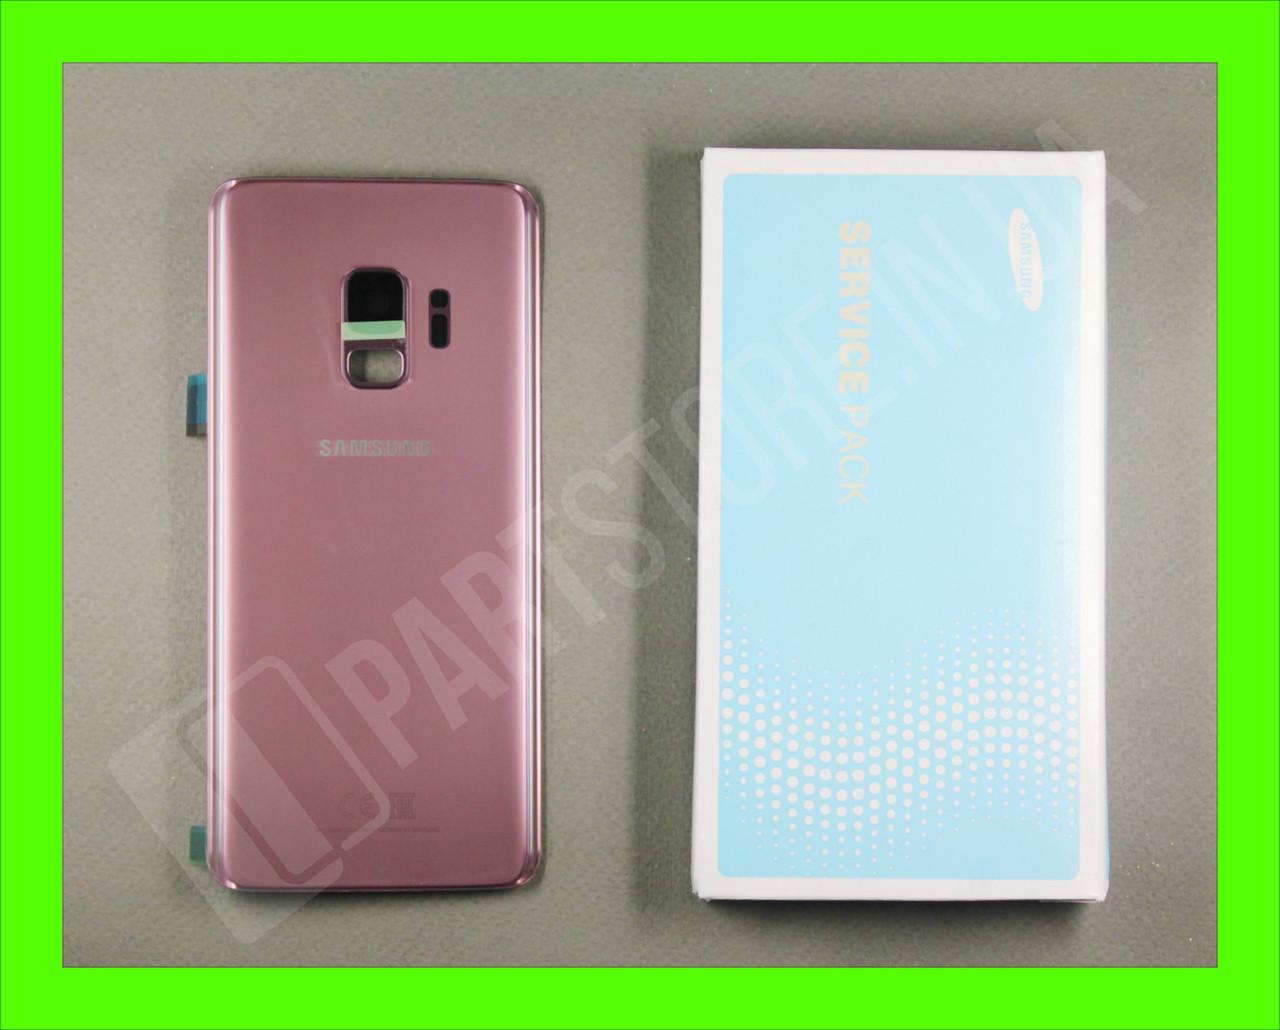 Cервисная оригинальная задняя Крышка Samsung G960 Lilac Purple S9 (GH82-15926B)